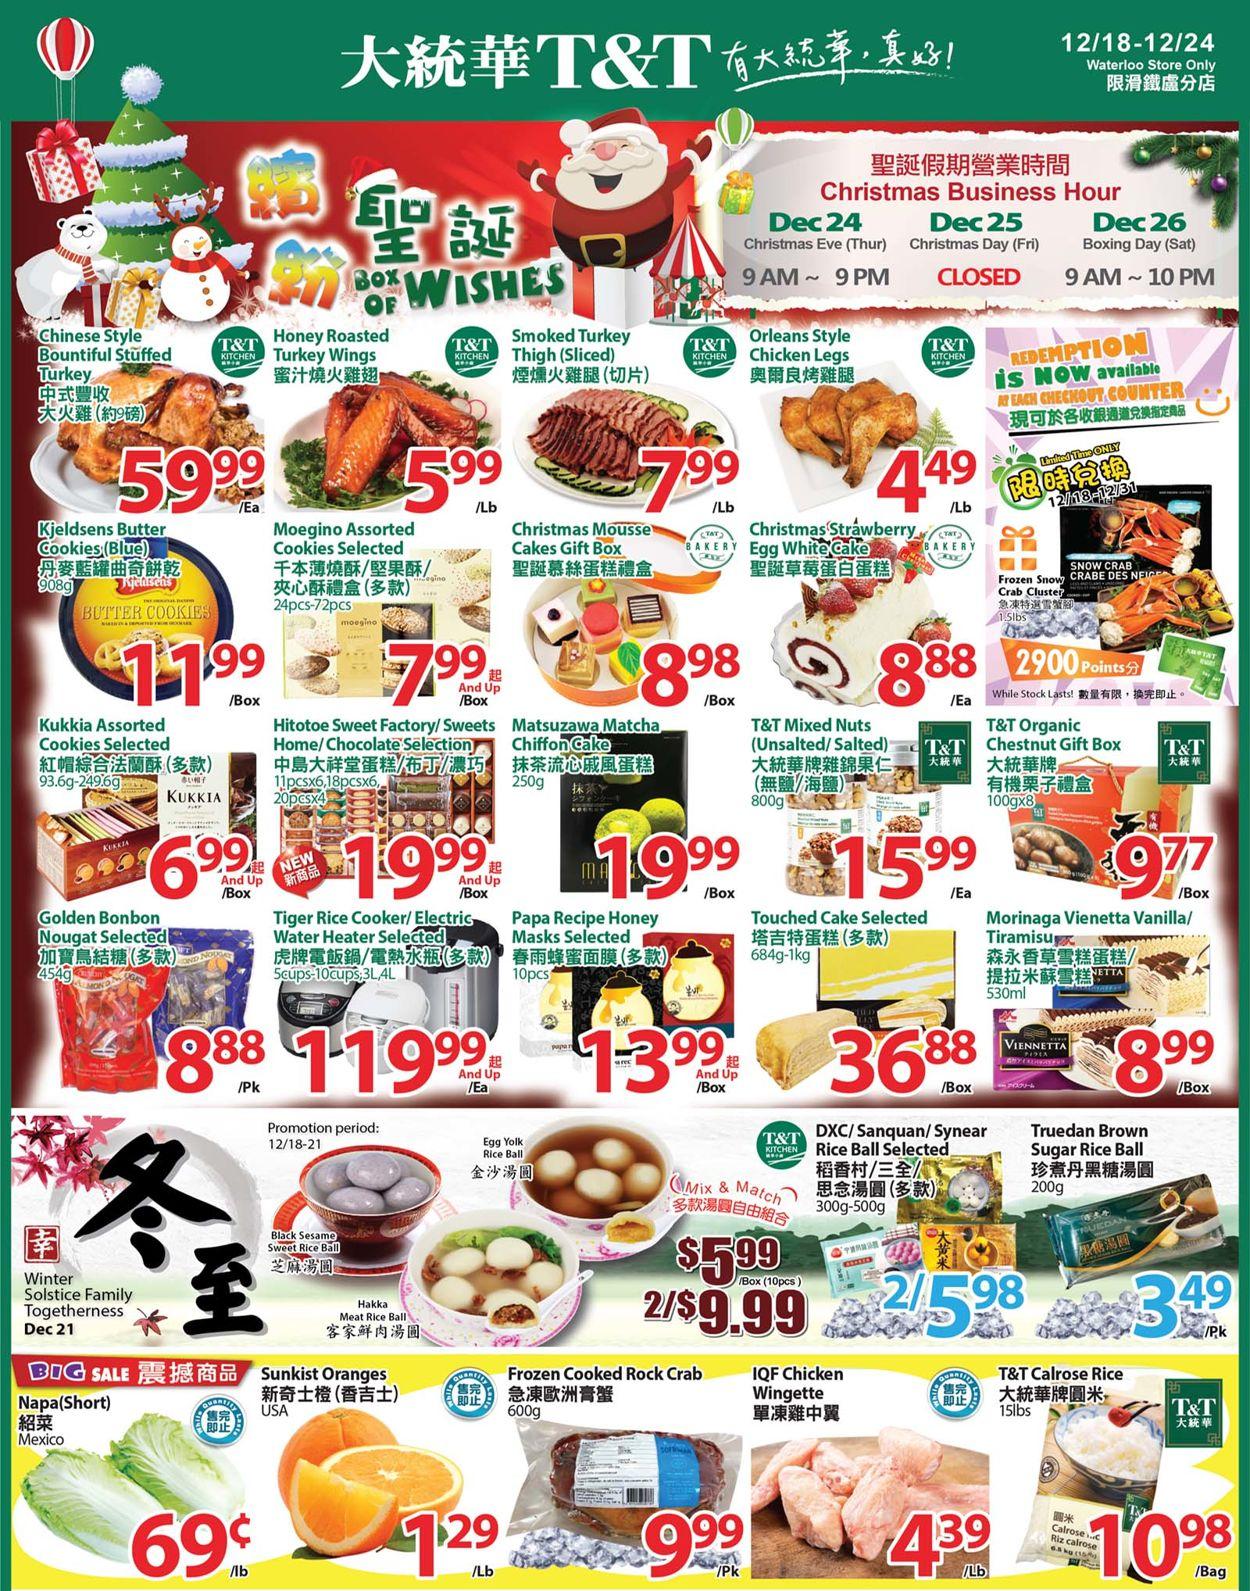 T&T Supermarket Christmas 2020 - Waterloo Flyer - 12/18-12/24/2020